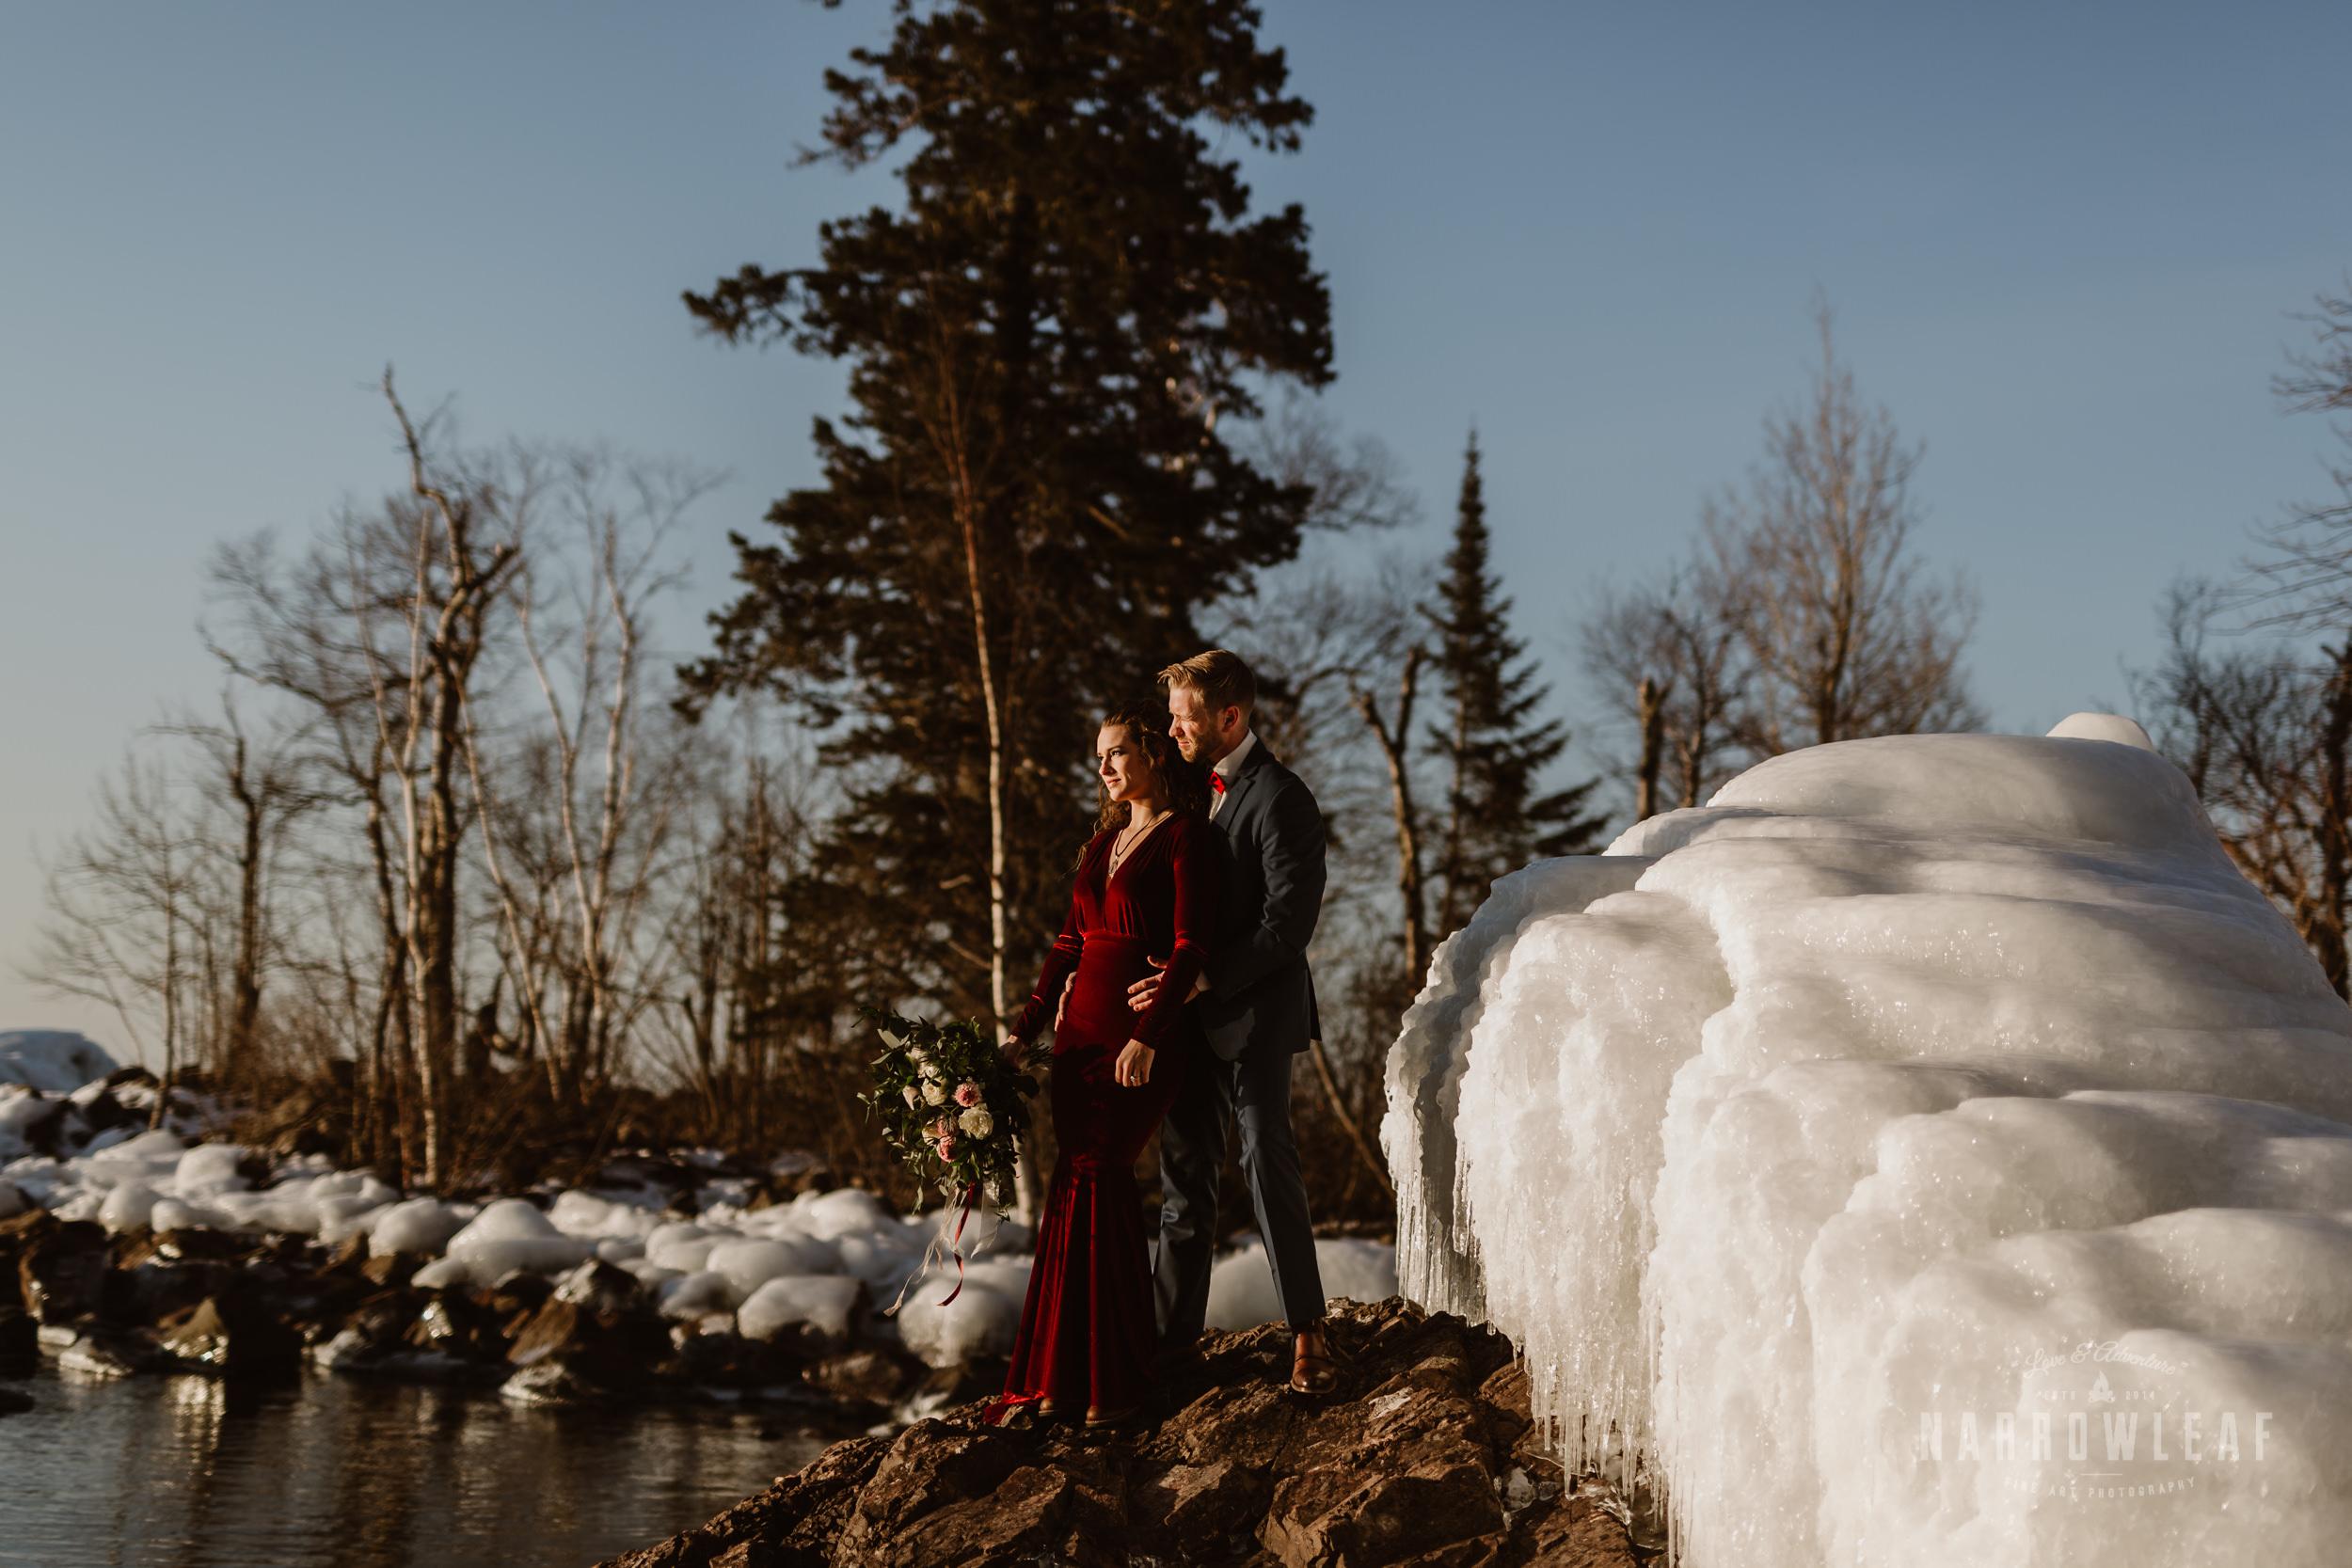 winter-adventure-elopement-tettegouche-state-park-minnesota-Narrowleaf_Love_and_Adventure_Photography-8472.jpg